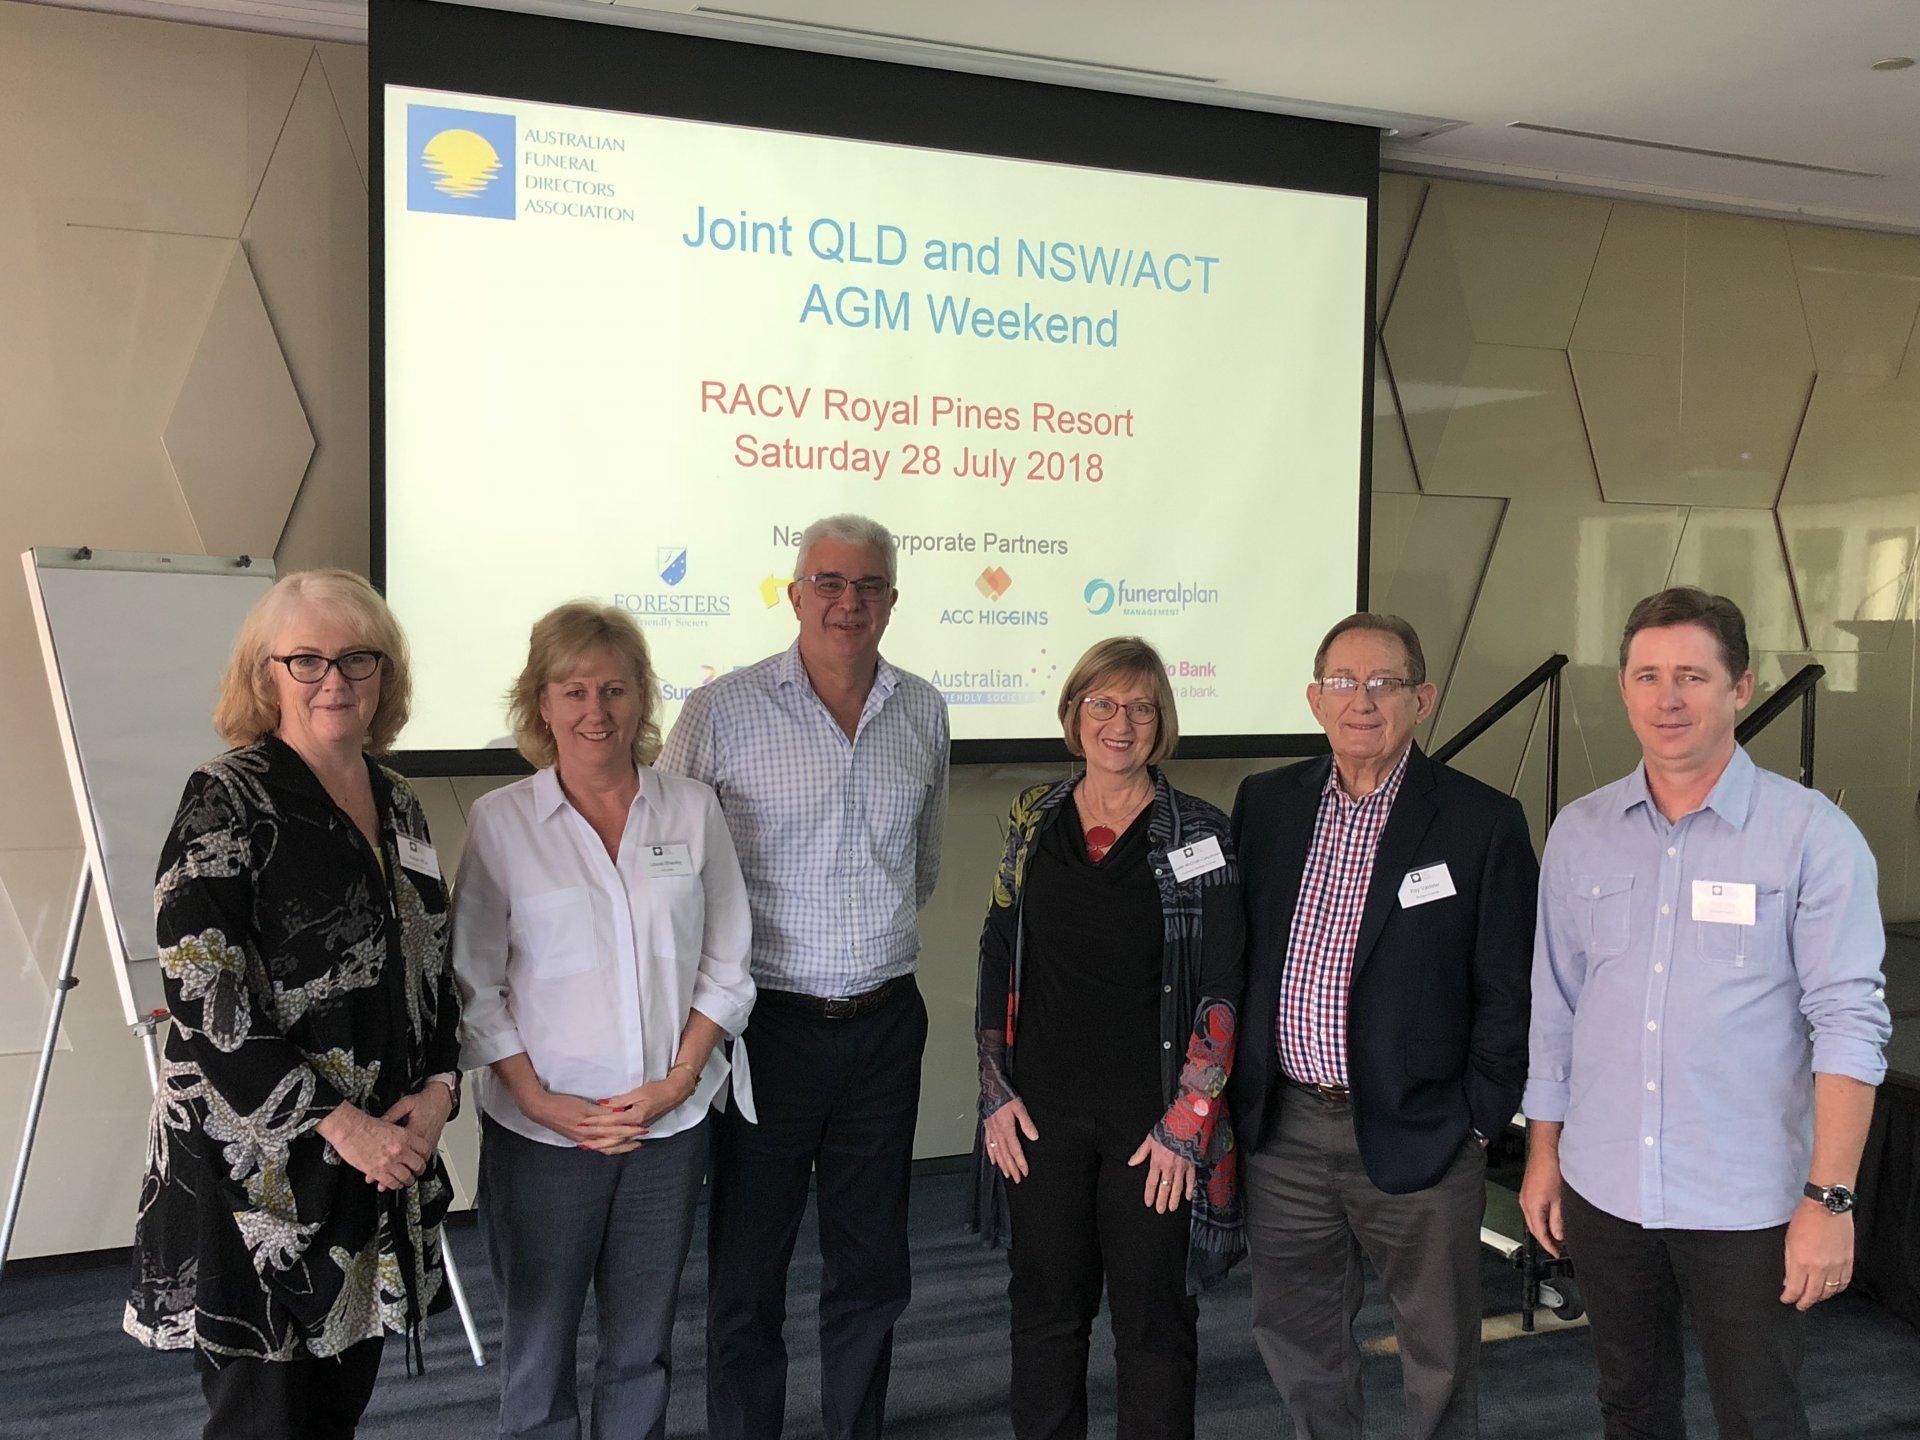 AFDA Queensland AGM Weekend 2018